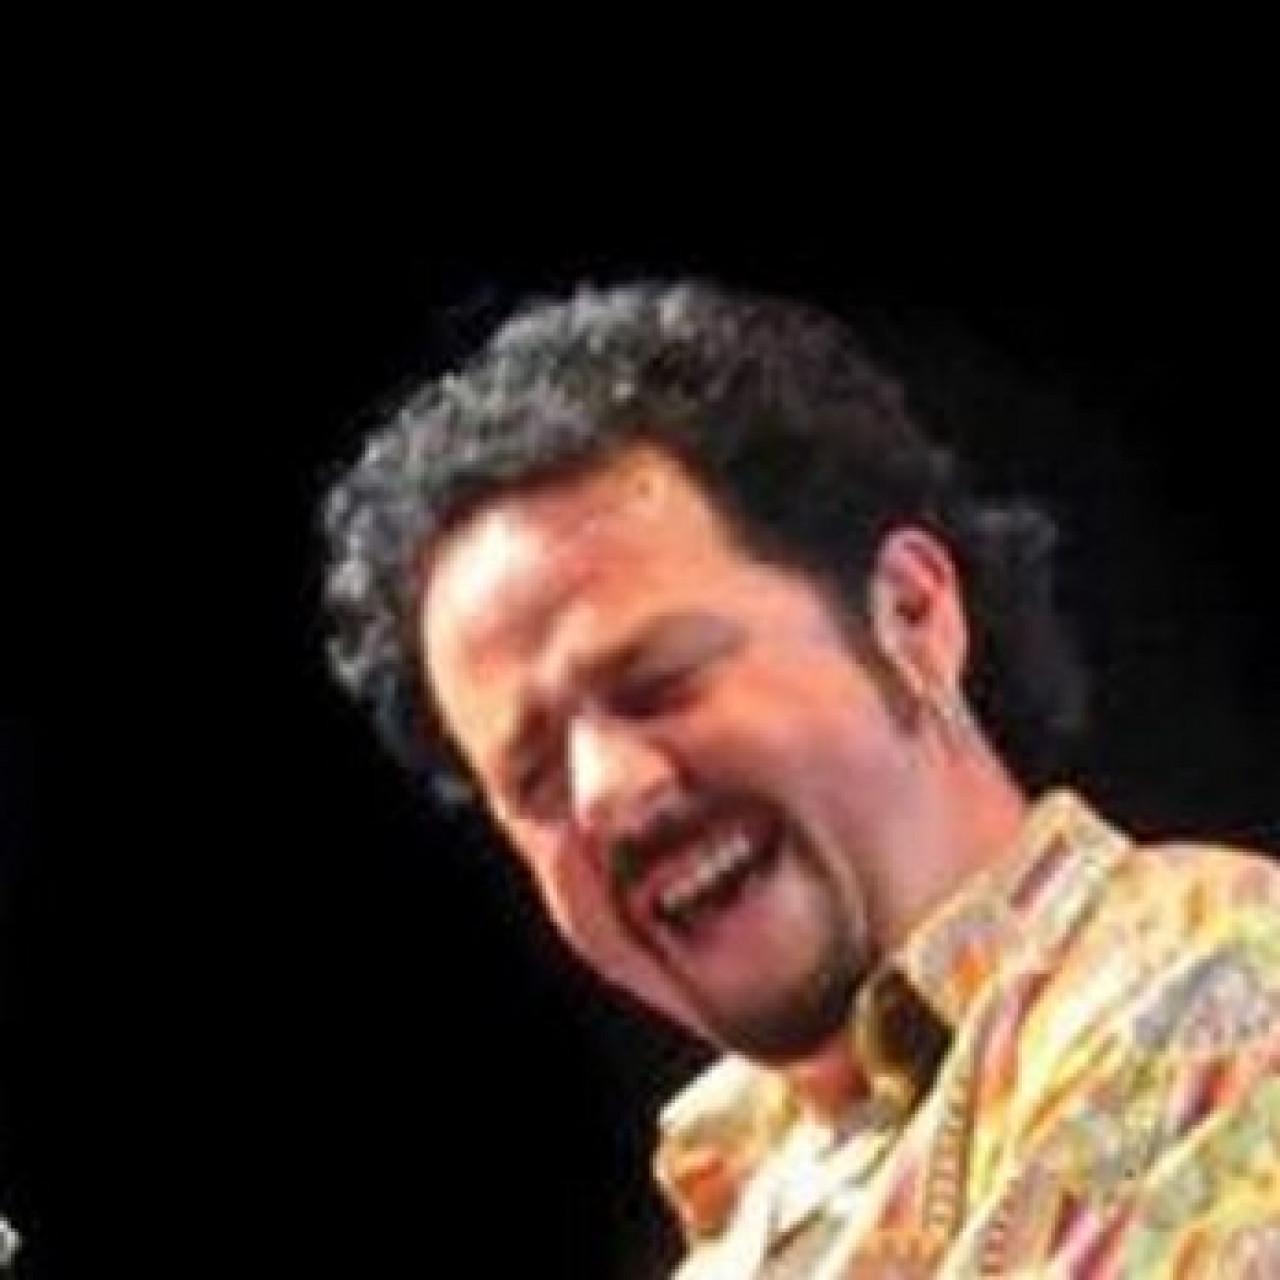 Steve Lukather Band - A38 Ship